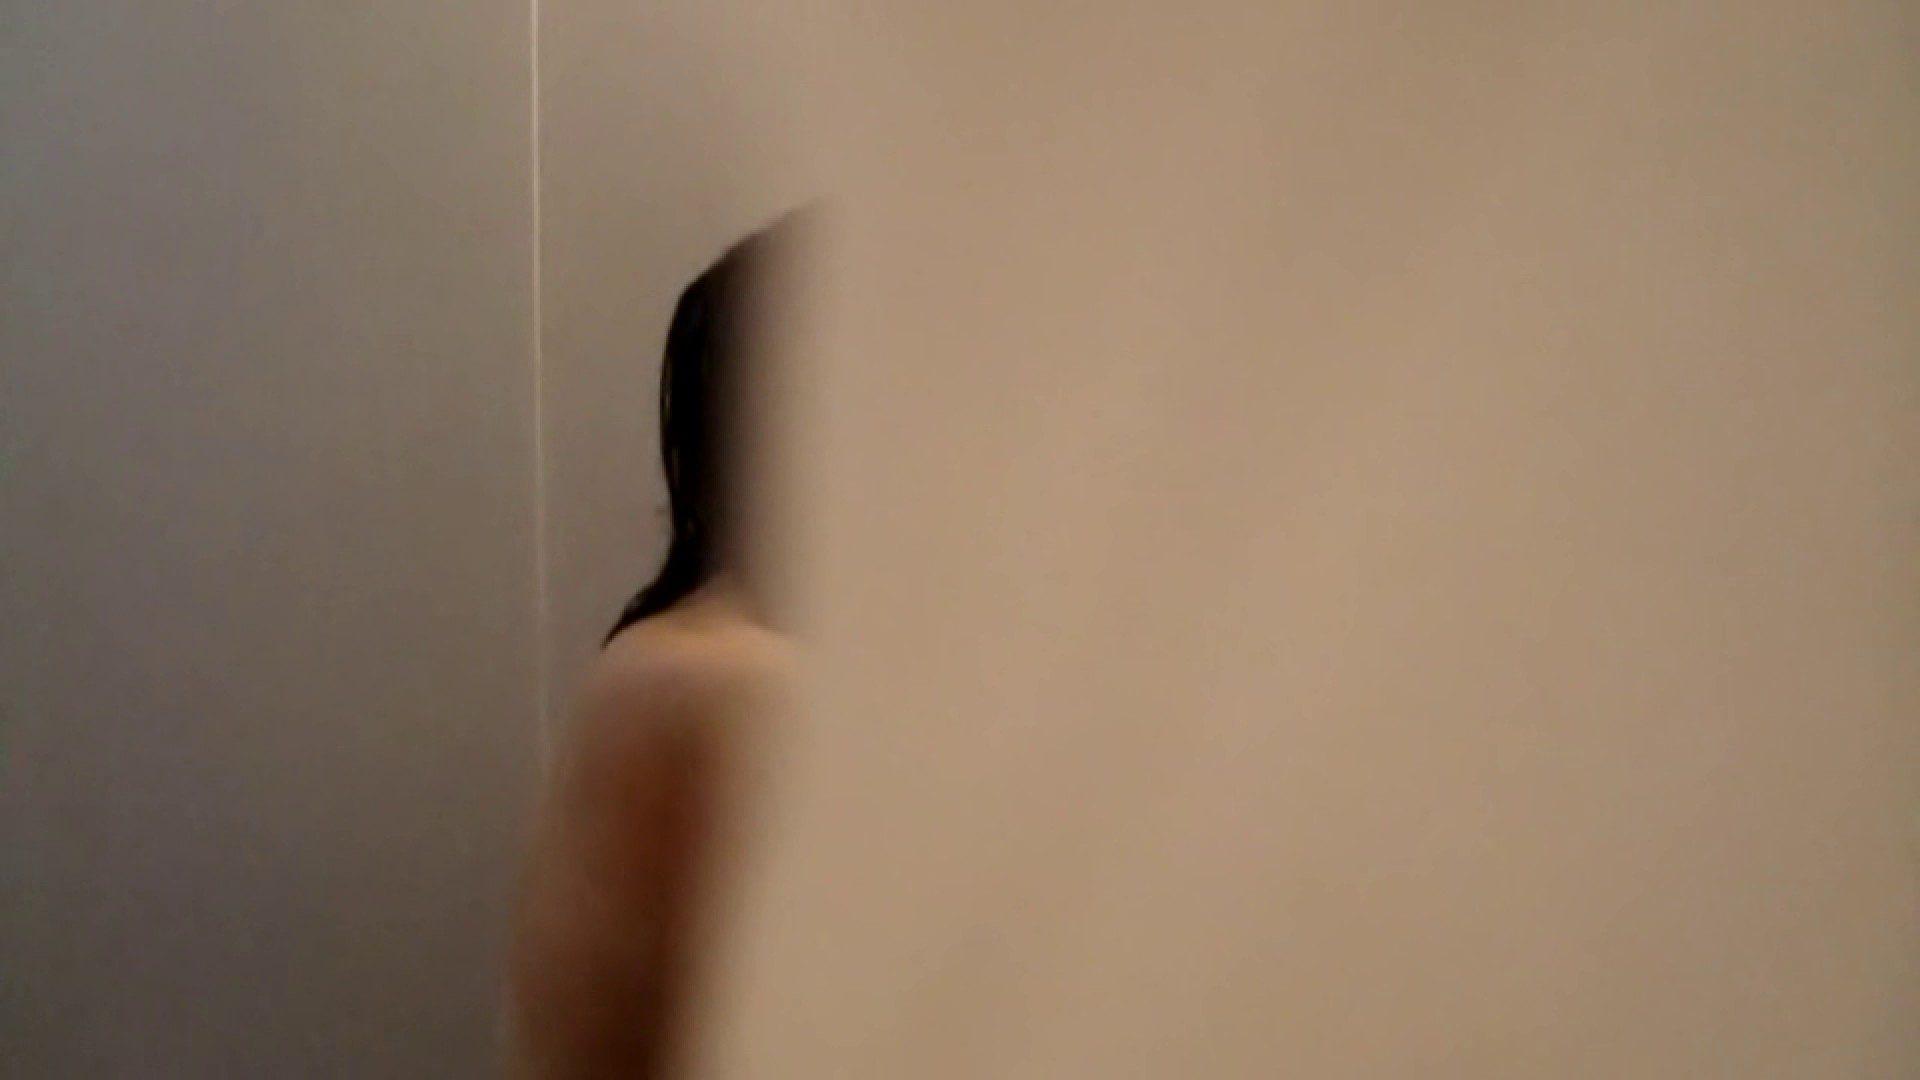 Vol.02 葵のグラドル顔負けの爆乳を入浴シーンでどうぞ。 OLのエロ生活  55連発 8